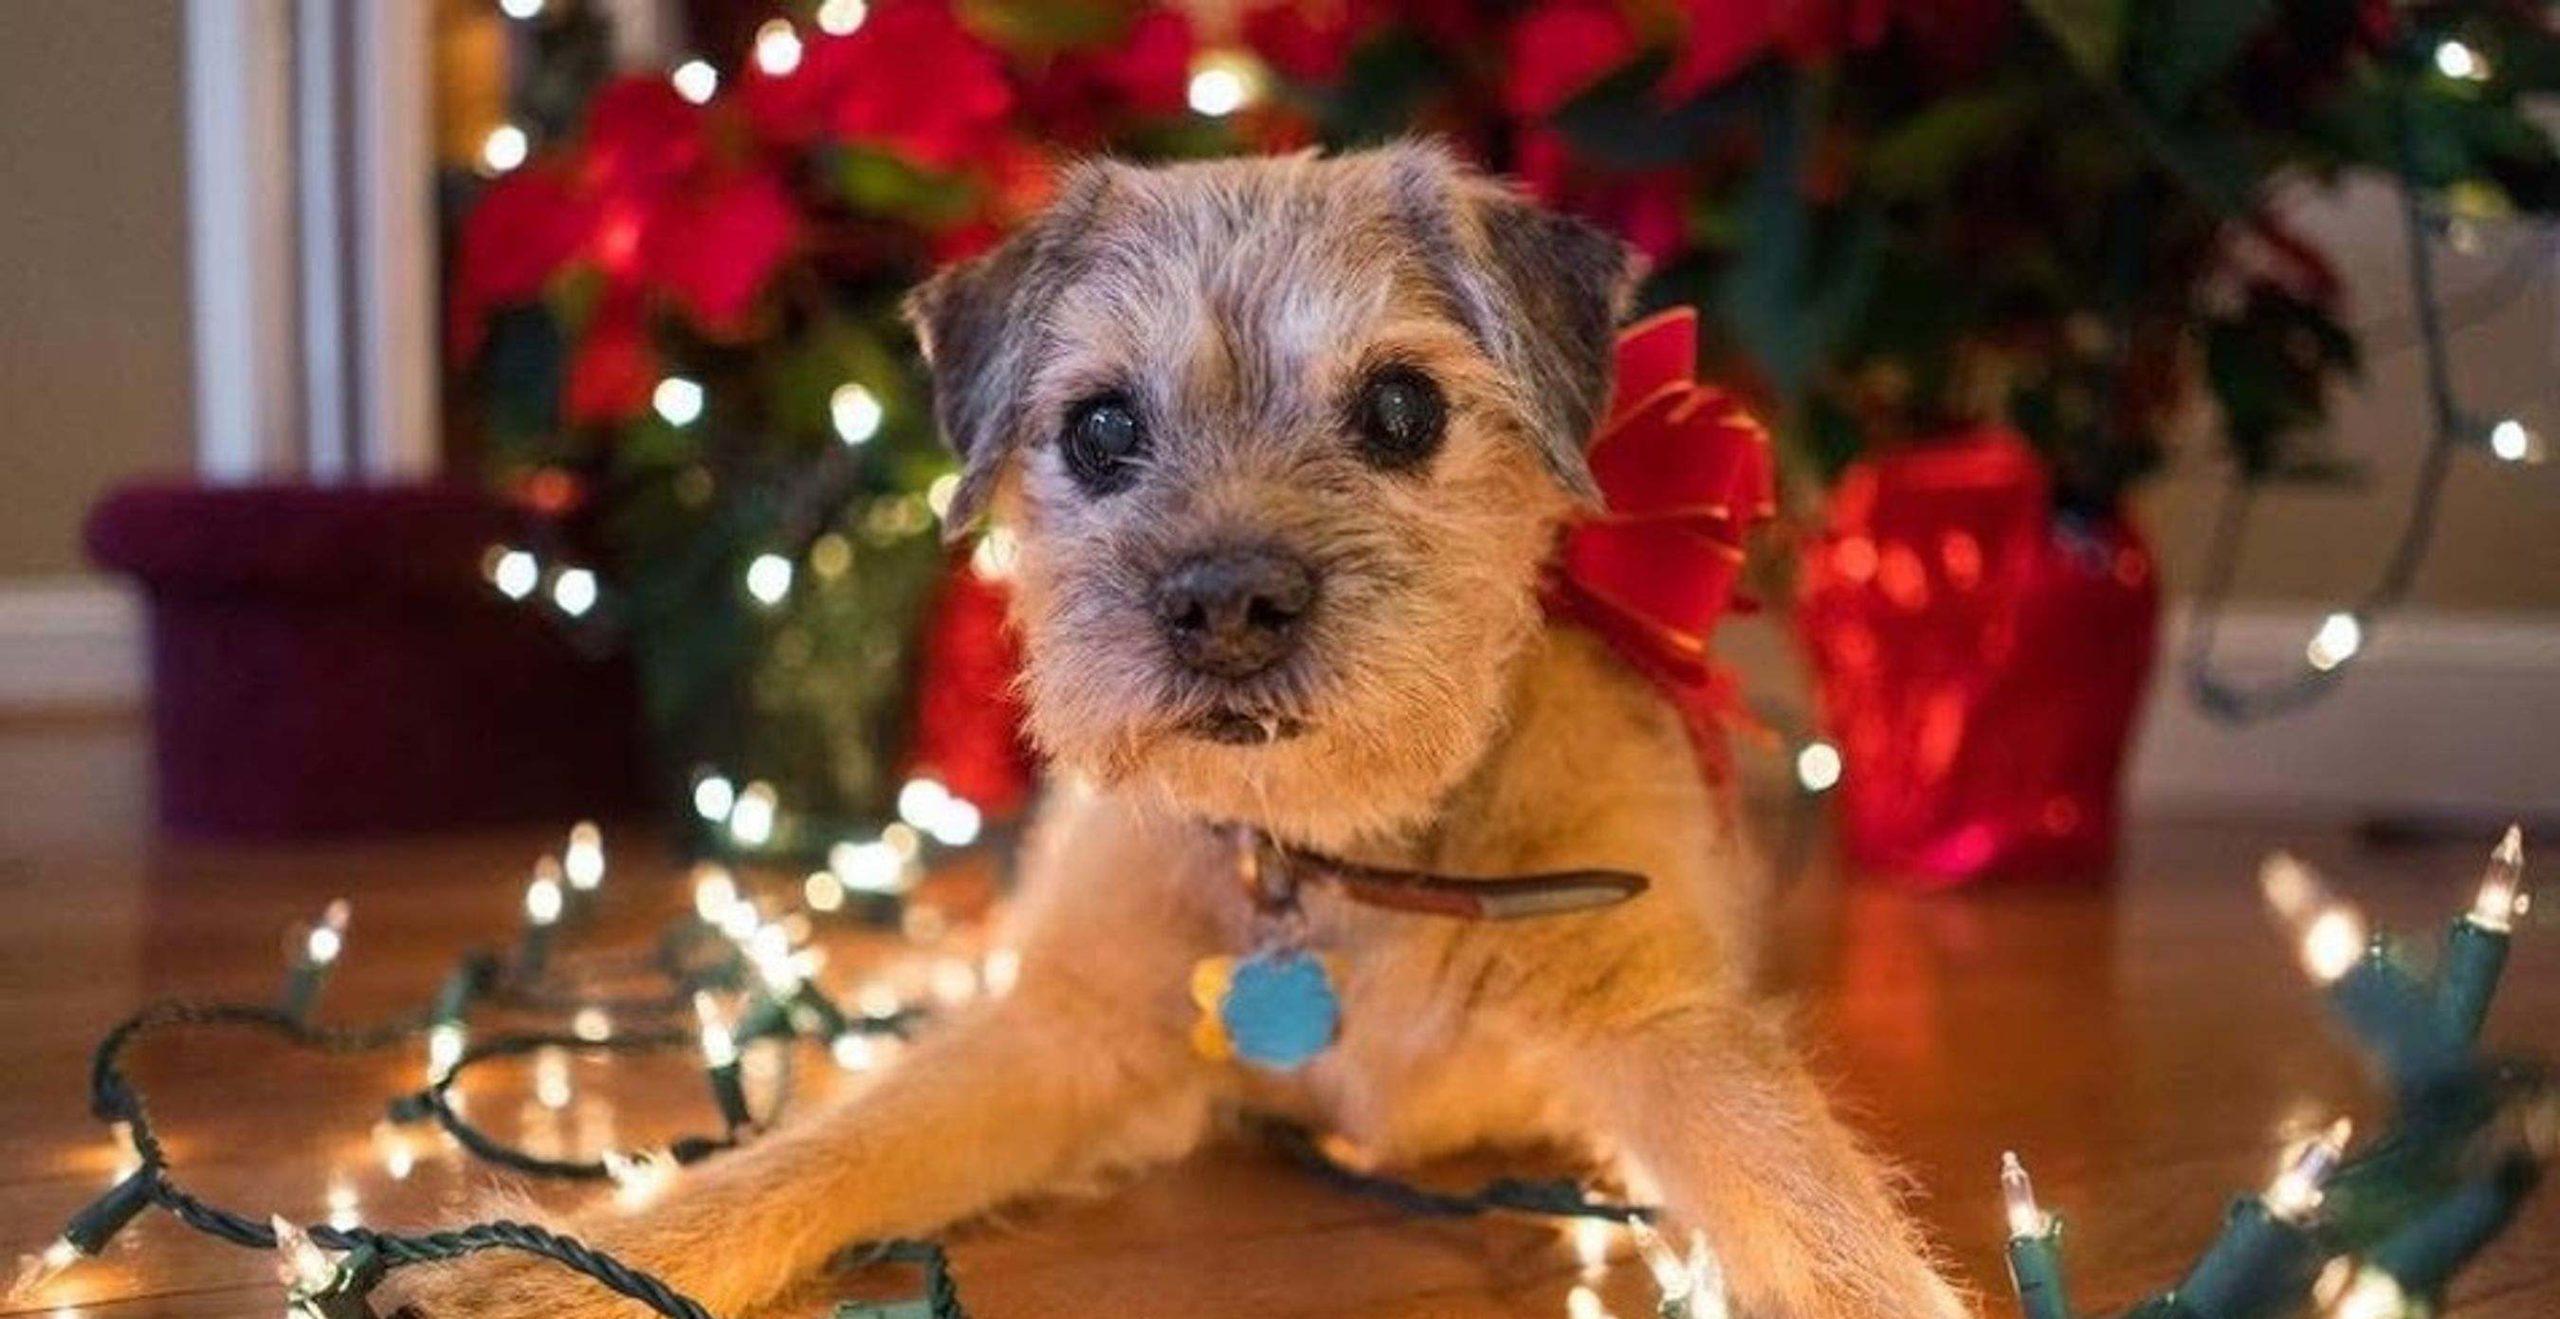 Border Terrier Dog Home Boarding Christmas Tree Lights Barking Mad